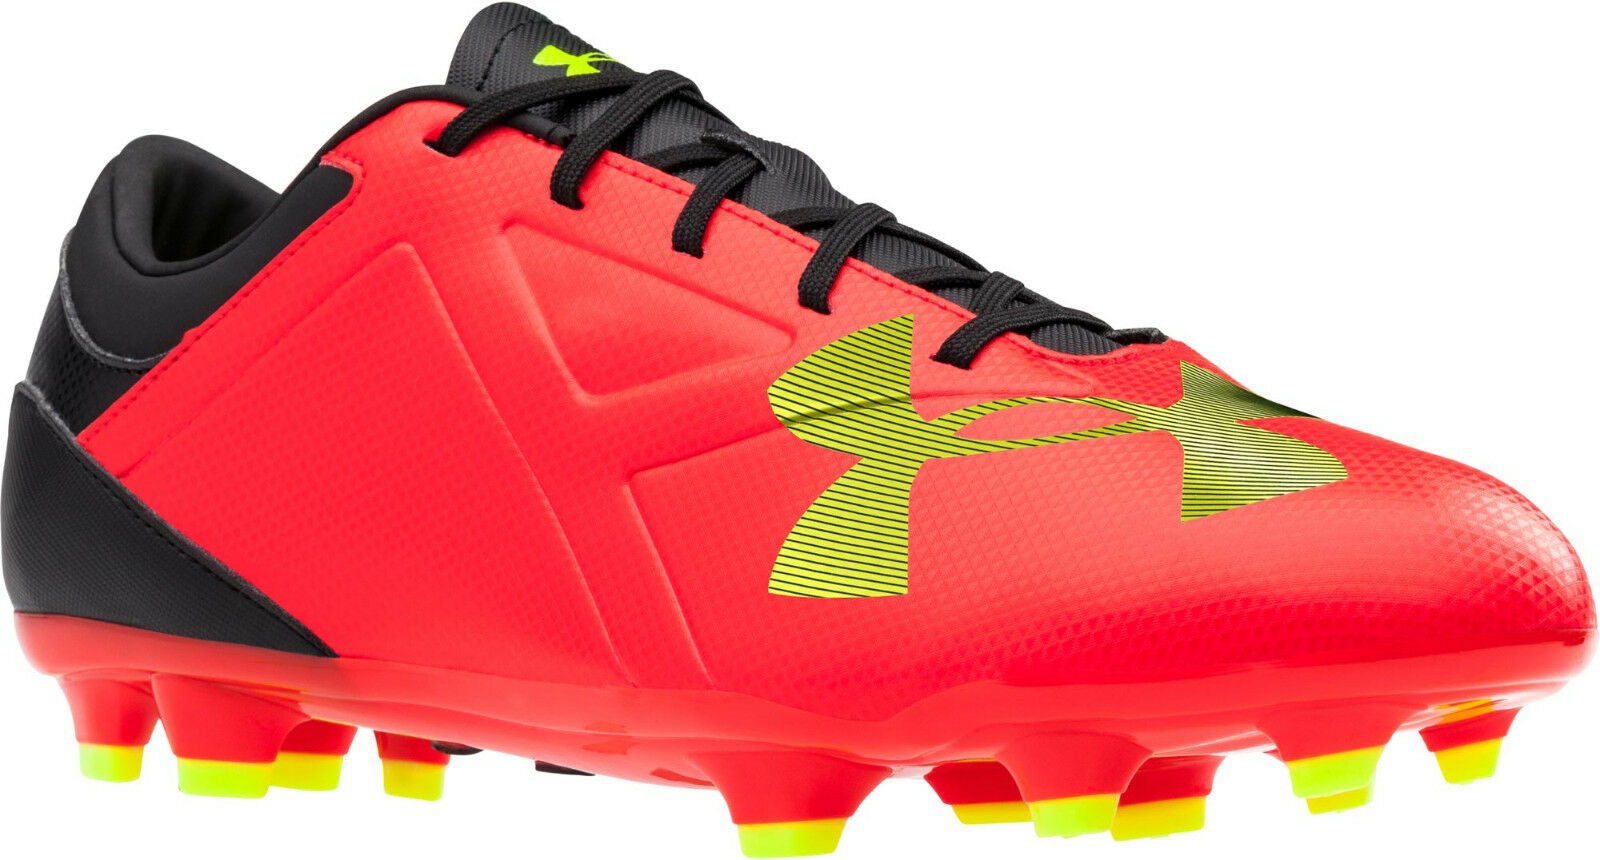 Under Armour UA Spotlight DL FG Soccer Cleats ( rouge ) 1272302-669